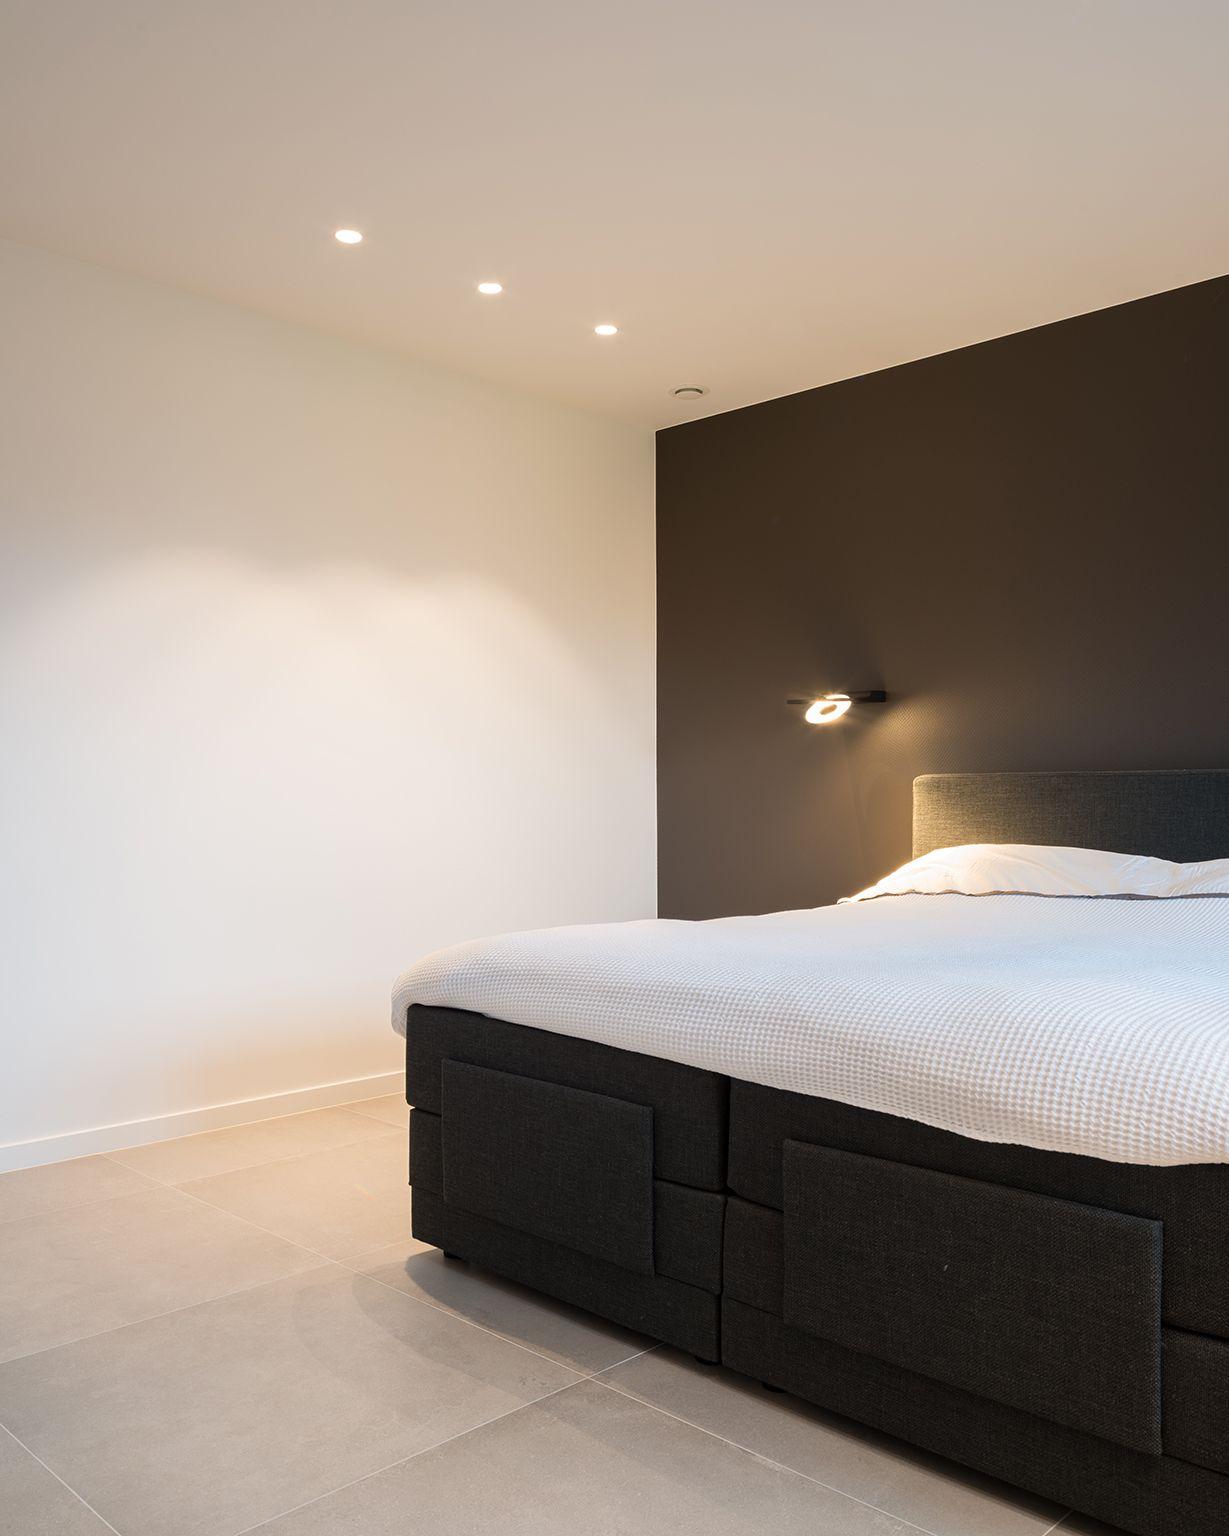 Recessed Lighting Ideas Spock Bedroom Light Fixtures Bedroom Lighting Track Lighting Bedroom